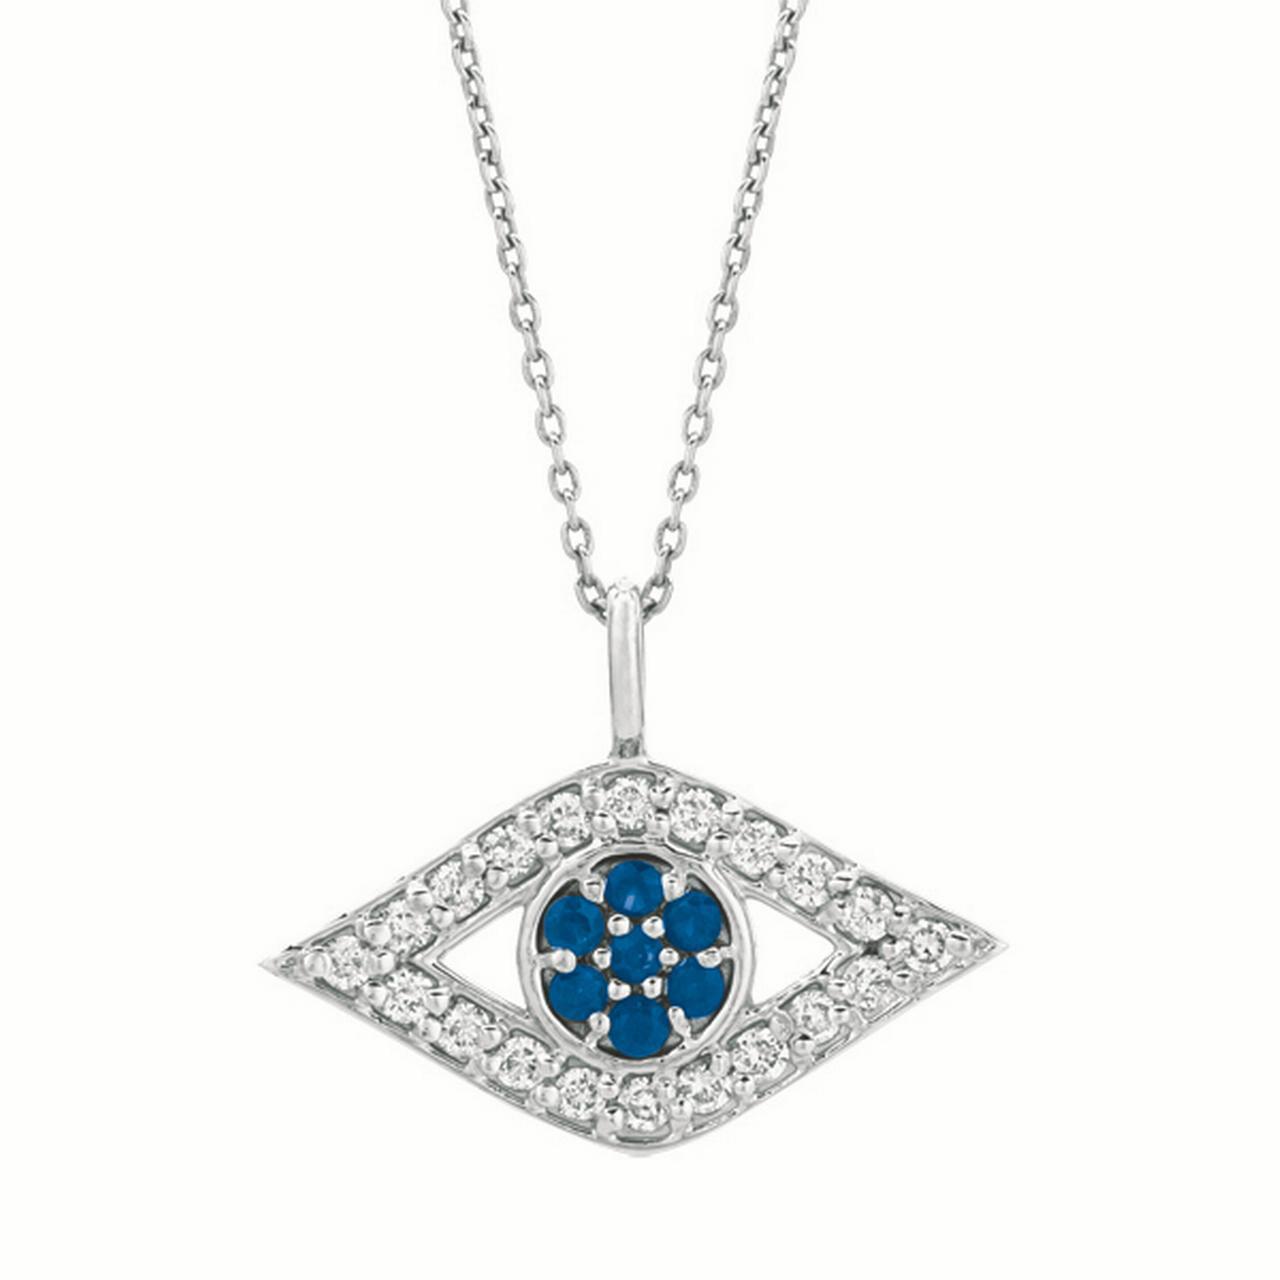 Diamond Jewelry, Sapphire: Eye Necklace, 14 Karat White Gold, Diamond Carat Total Weight: 0.35, Sapphire: 0.15, Chain 18... by Diamond Jewelry